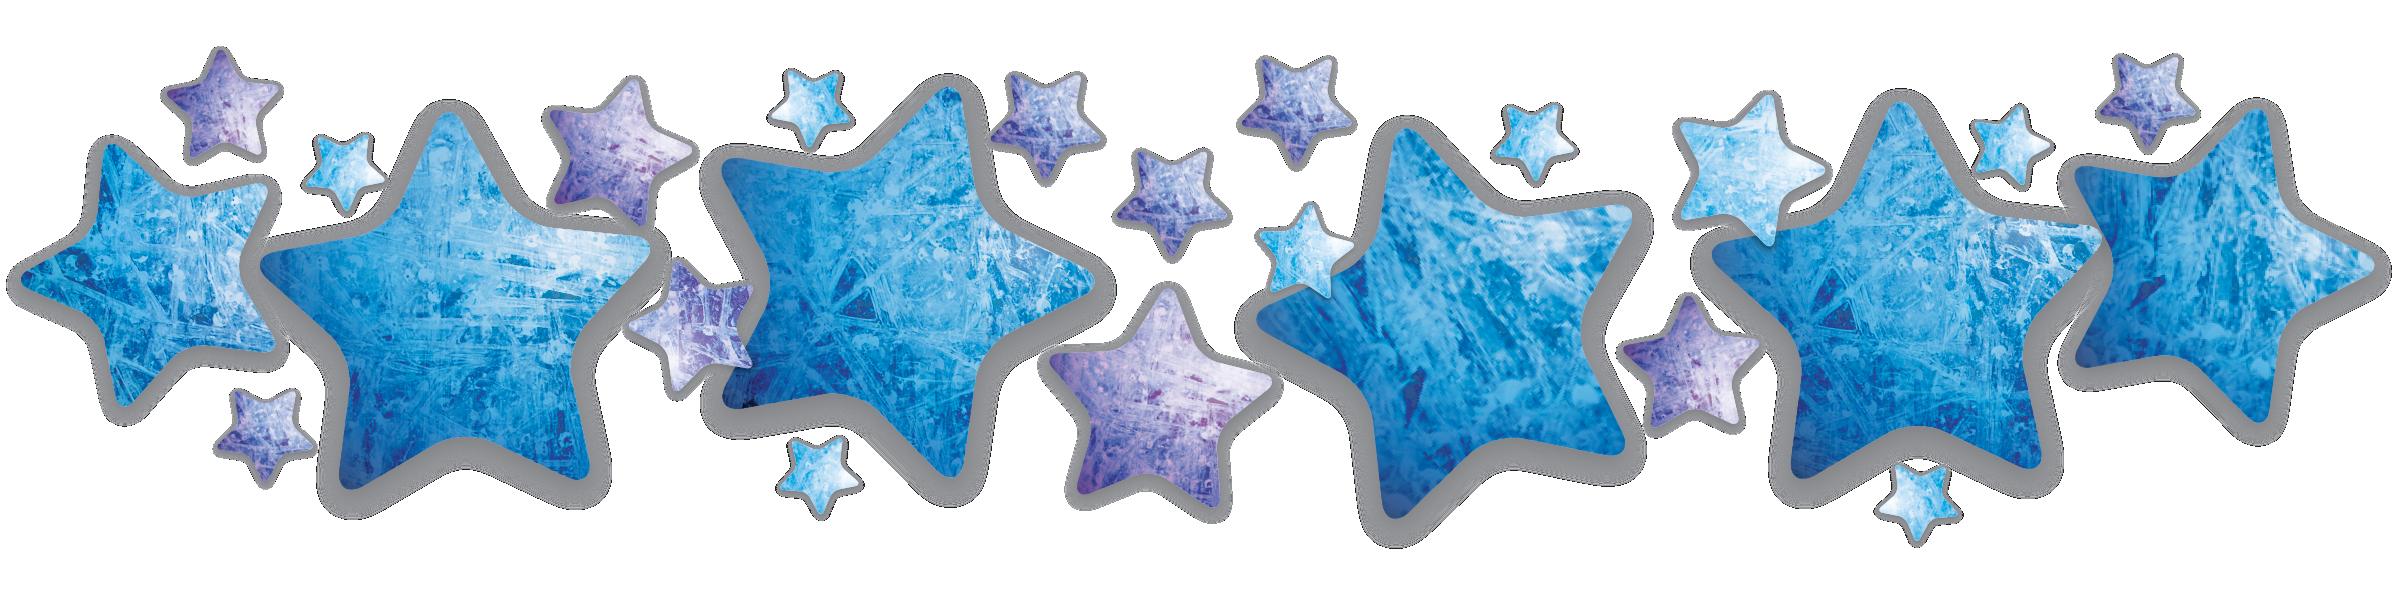 stars-maialisapixabay